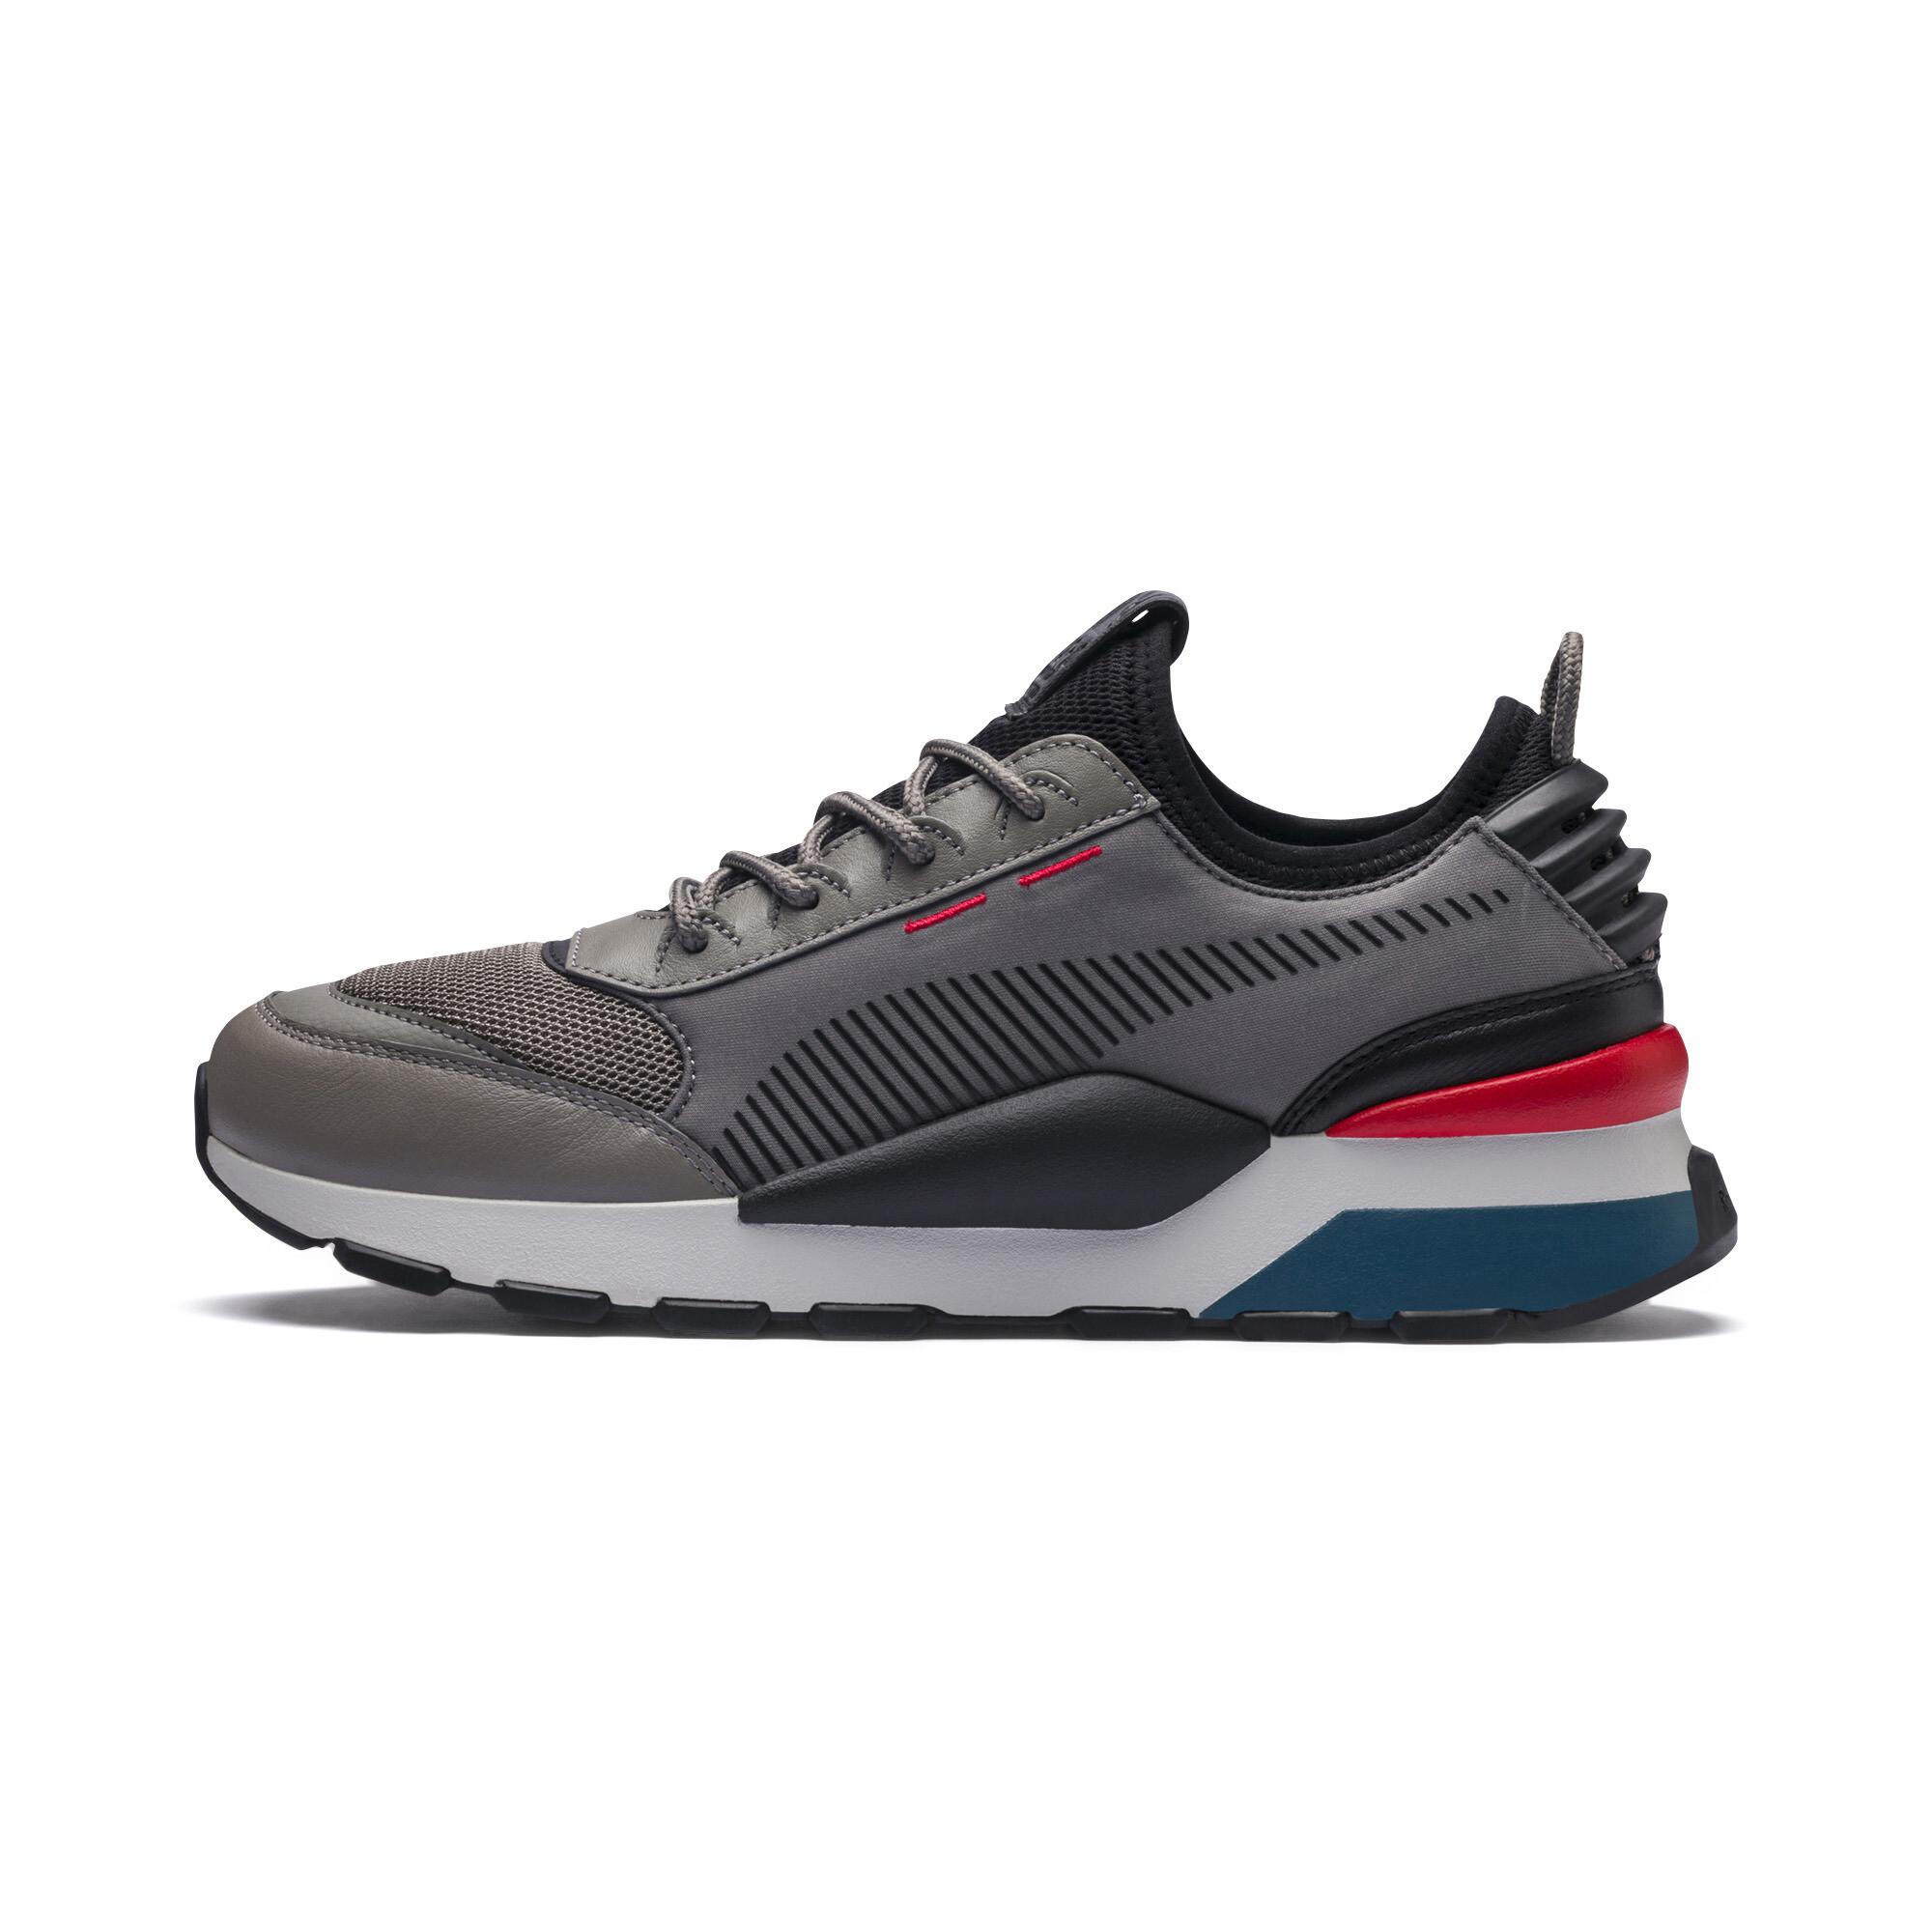 PUMA-RS-0-Tracks-Unisex-Shoe-Evolution thumbnail 17